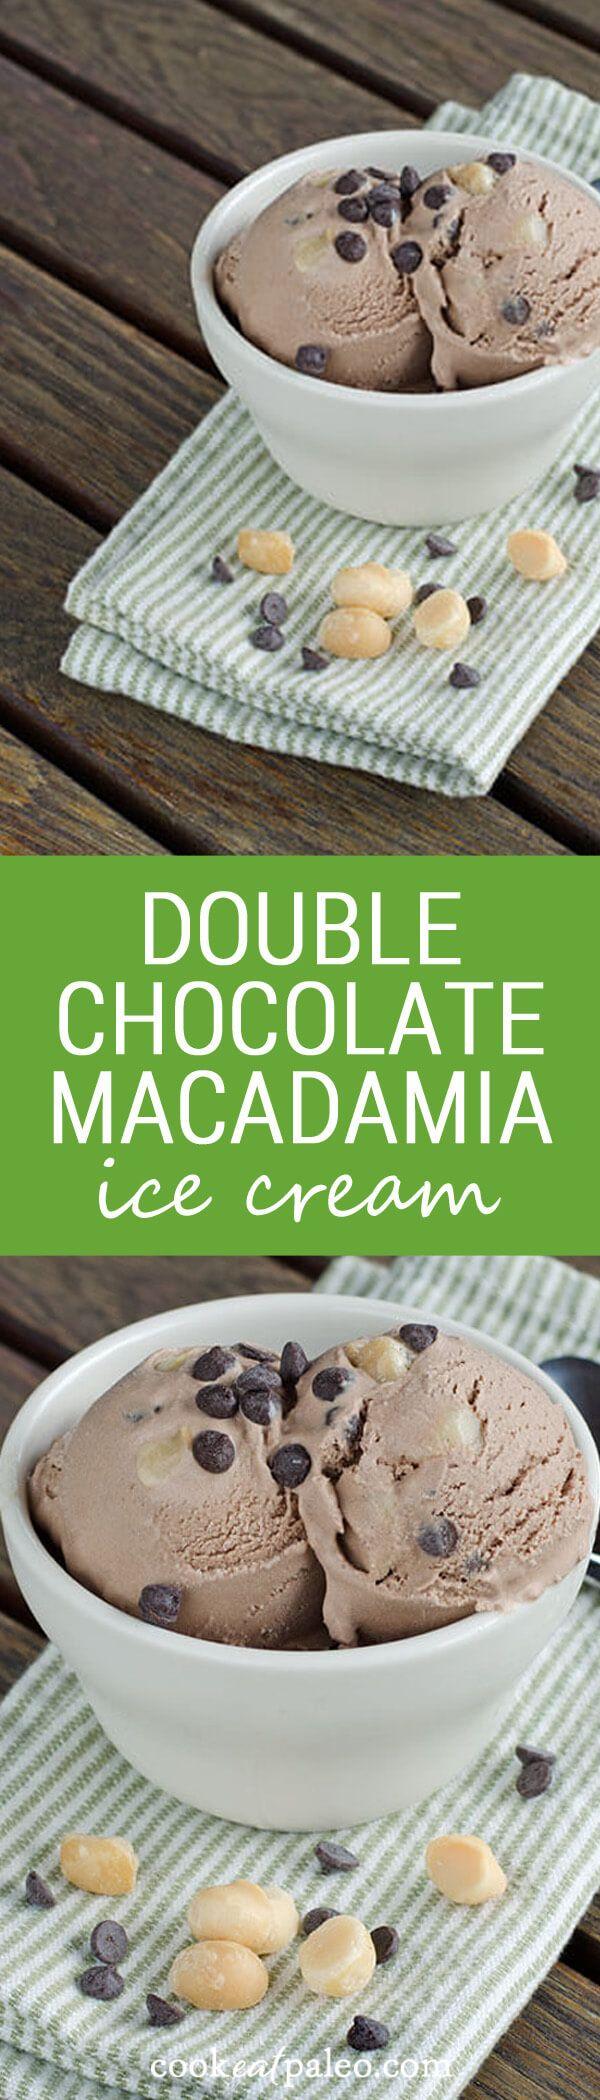 easy double chocolate macadamia ice cream really delivers on chocolate ...